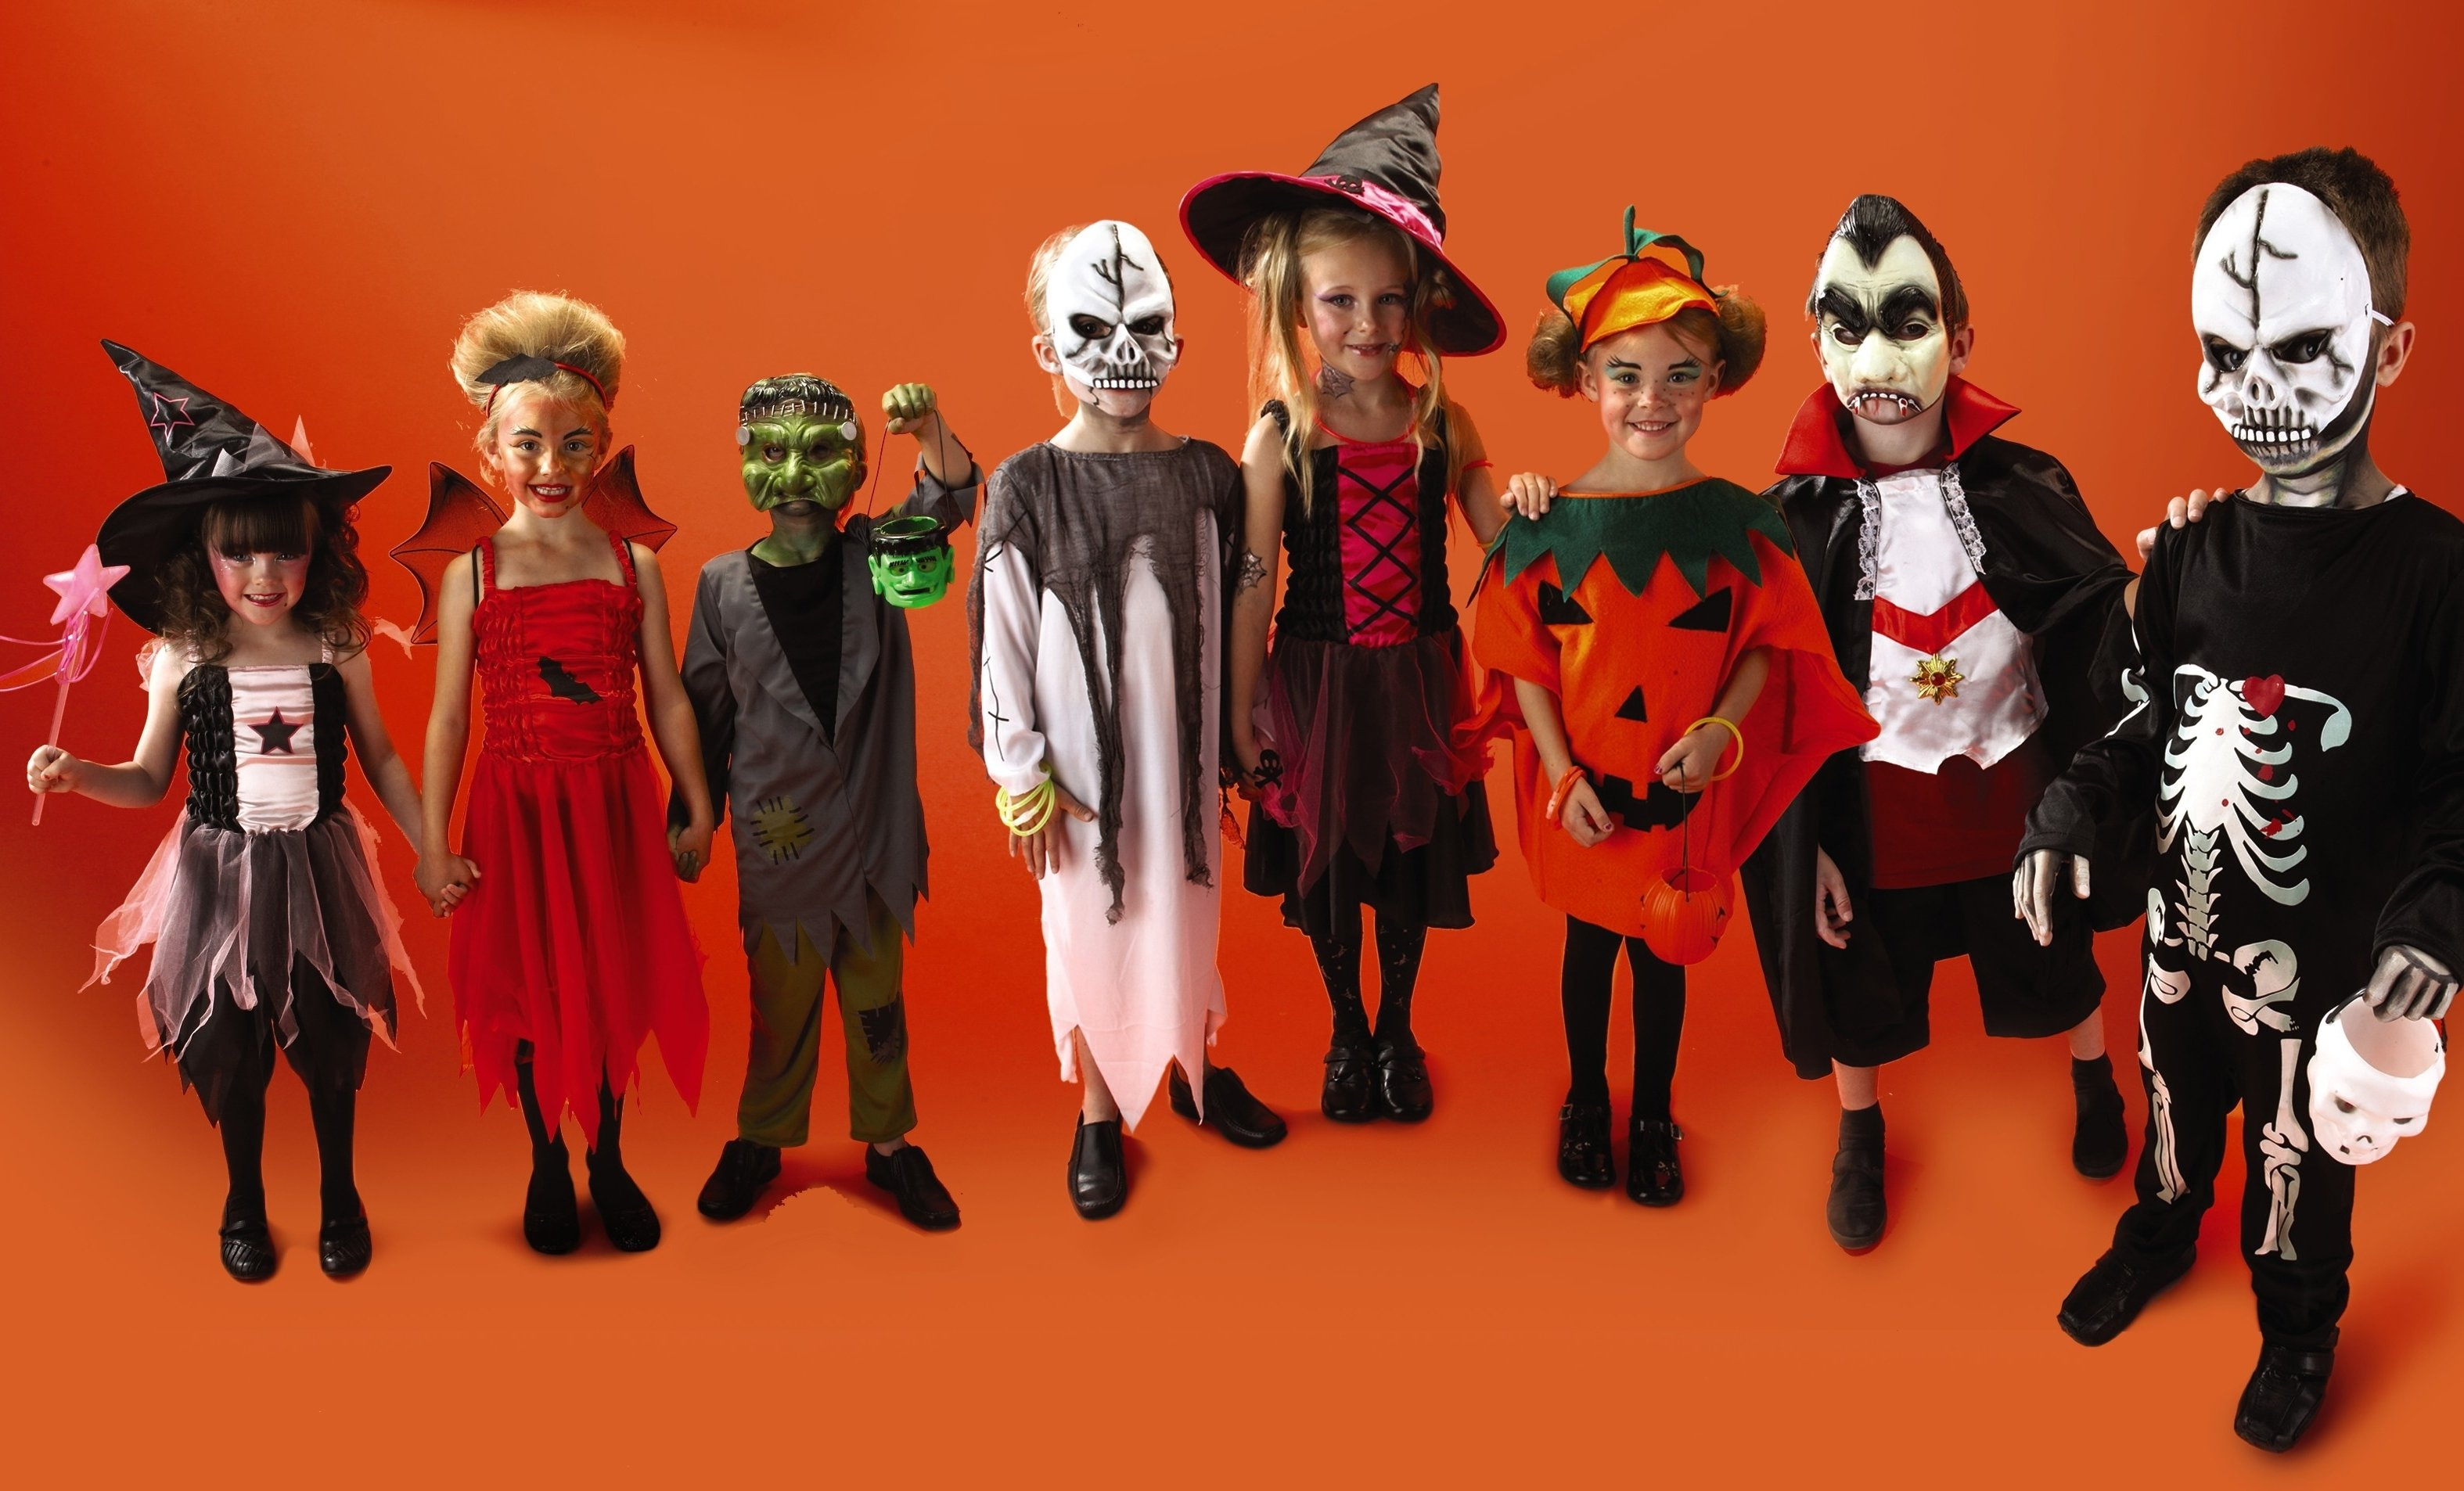 10 Lovable Boy Girl Halloween Costume Ideas 7 childrens halloween costume ideas lakeside collection blog 2021